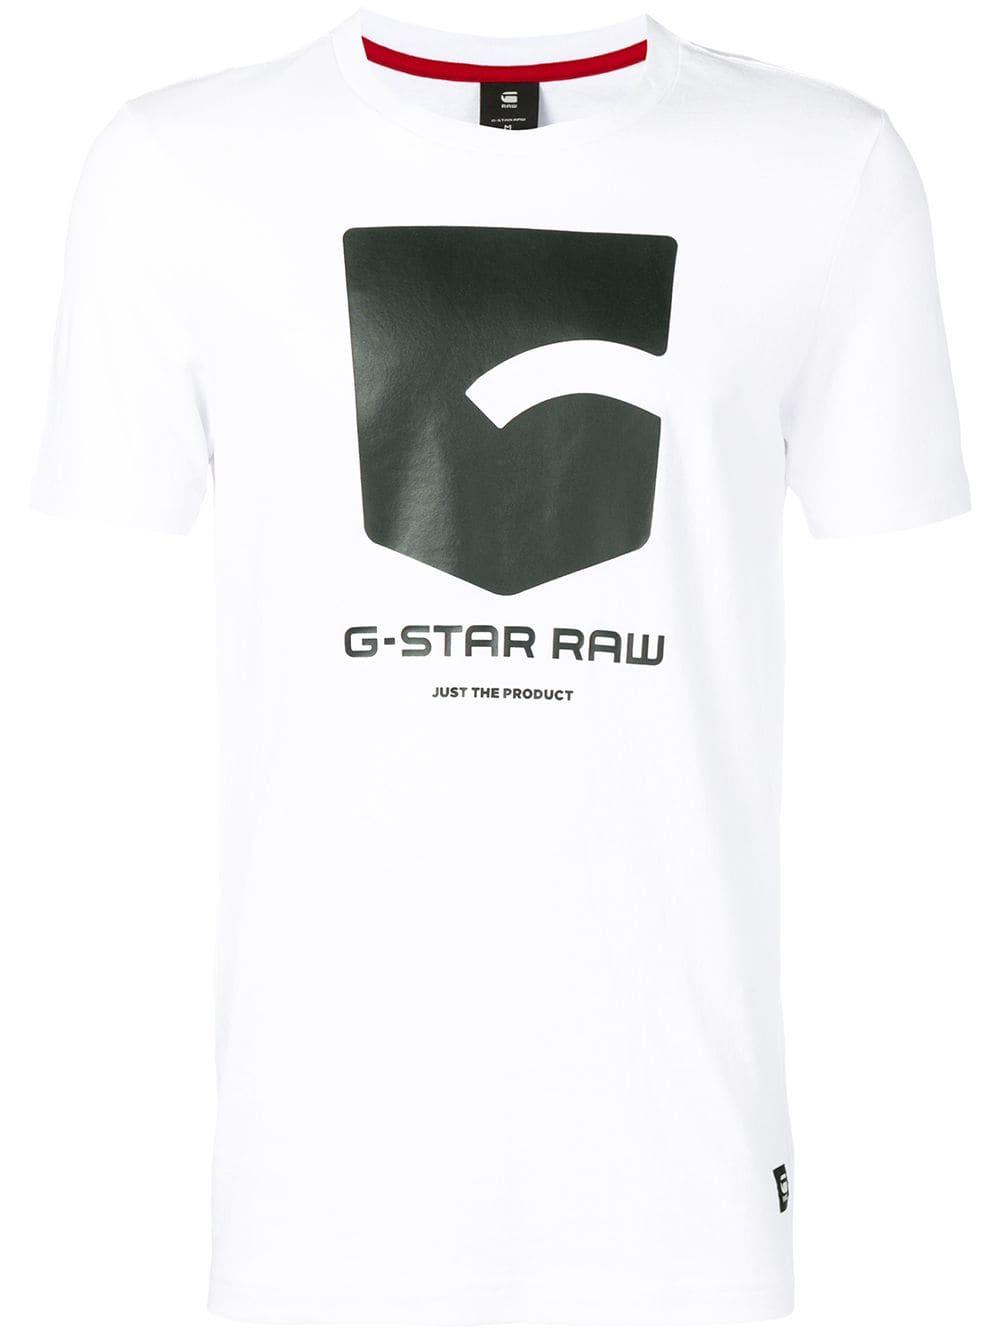 G Star Raw Research regular logo T shirt White   G star